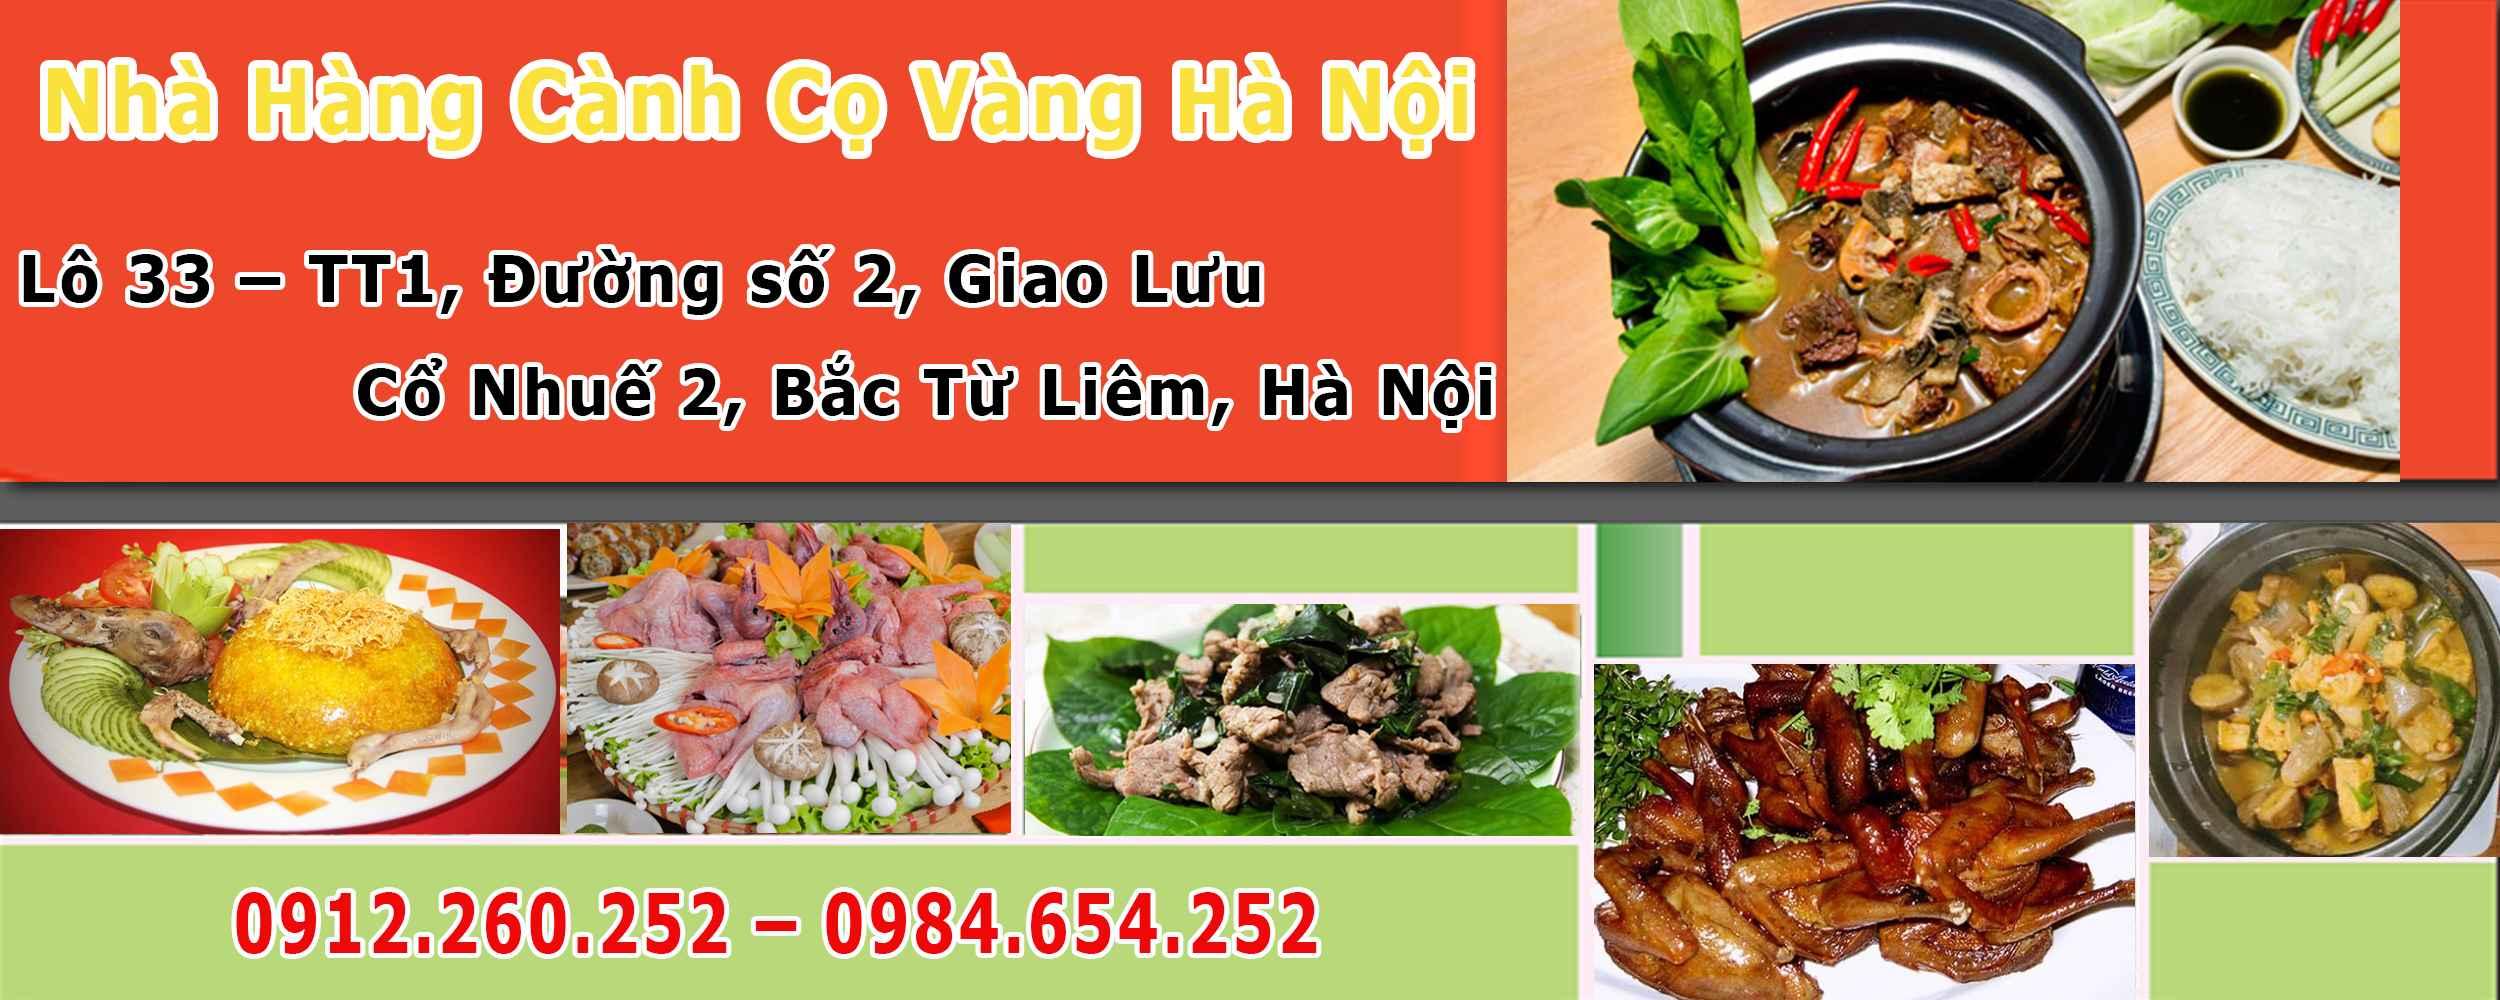 banner-nha-hang-canh-co-vang